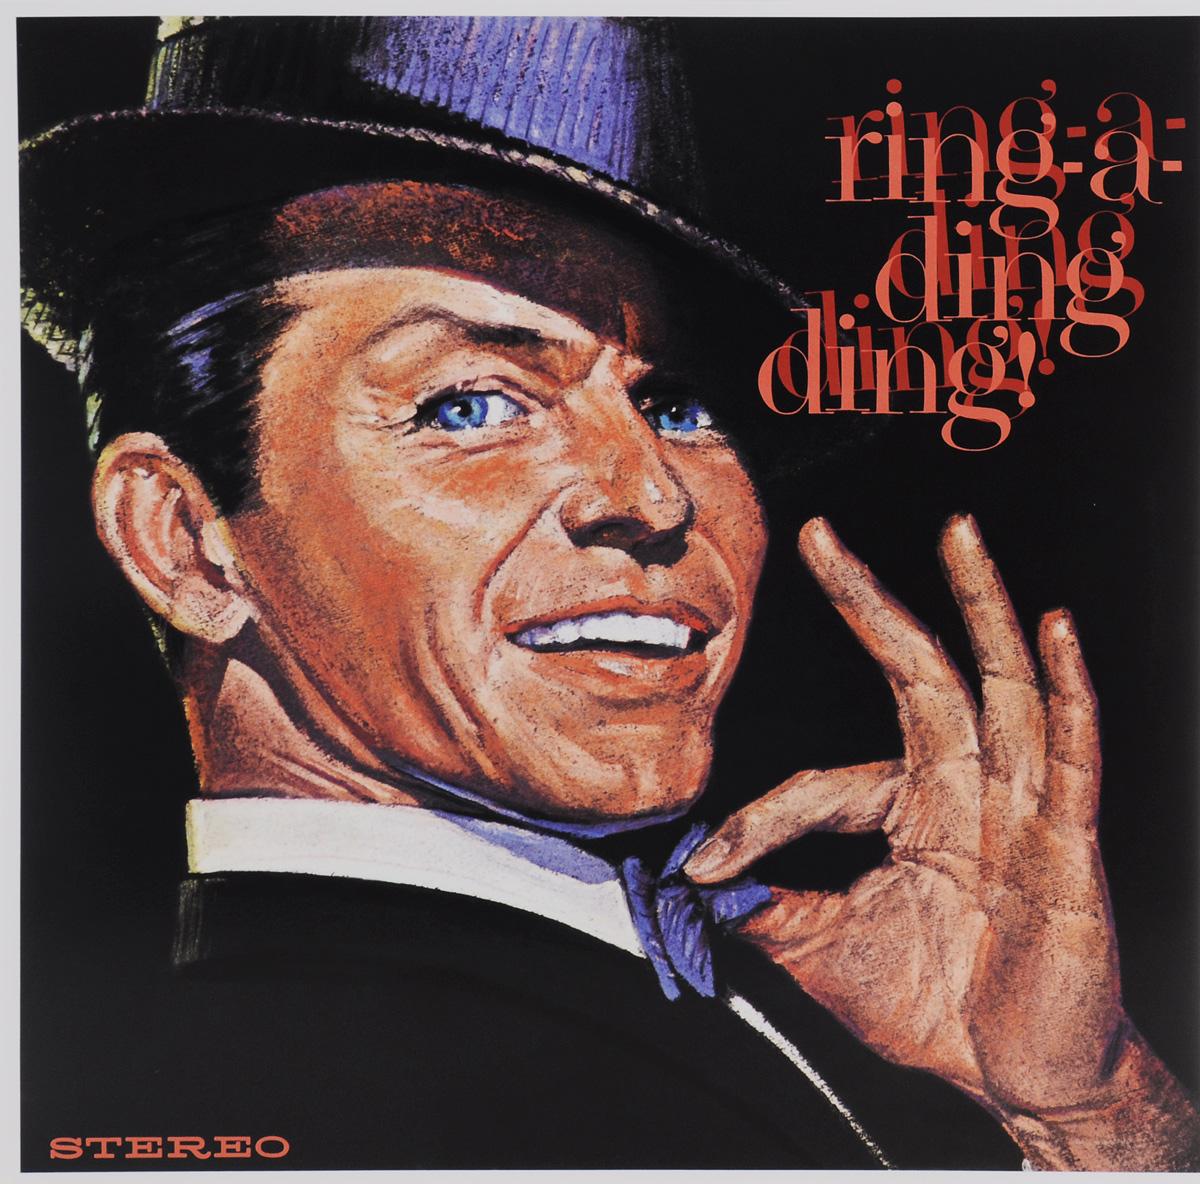 Фрэнк Синатра Frank Sinatra. Ring-A-Ding Ding! (LP) frank sinatra frank sinatra francis albert sinatra and antonio carlos jobim